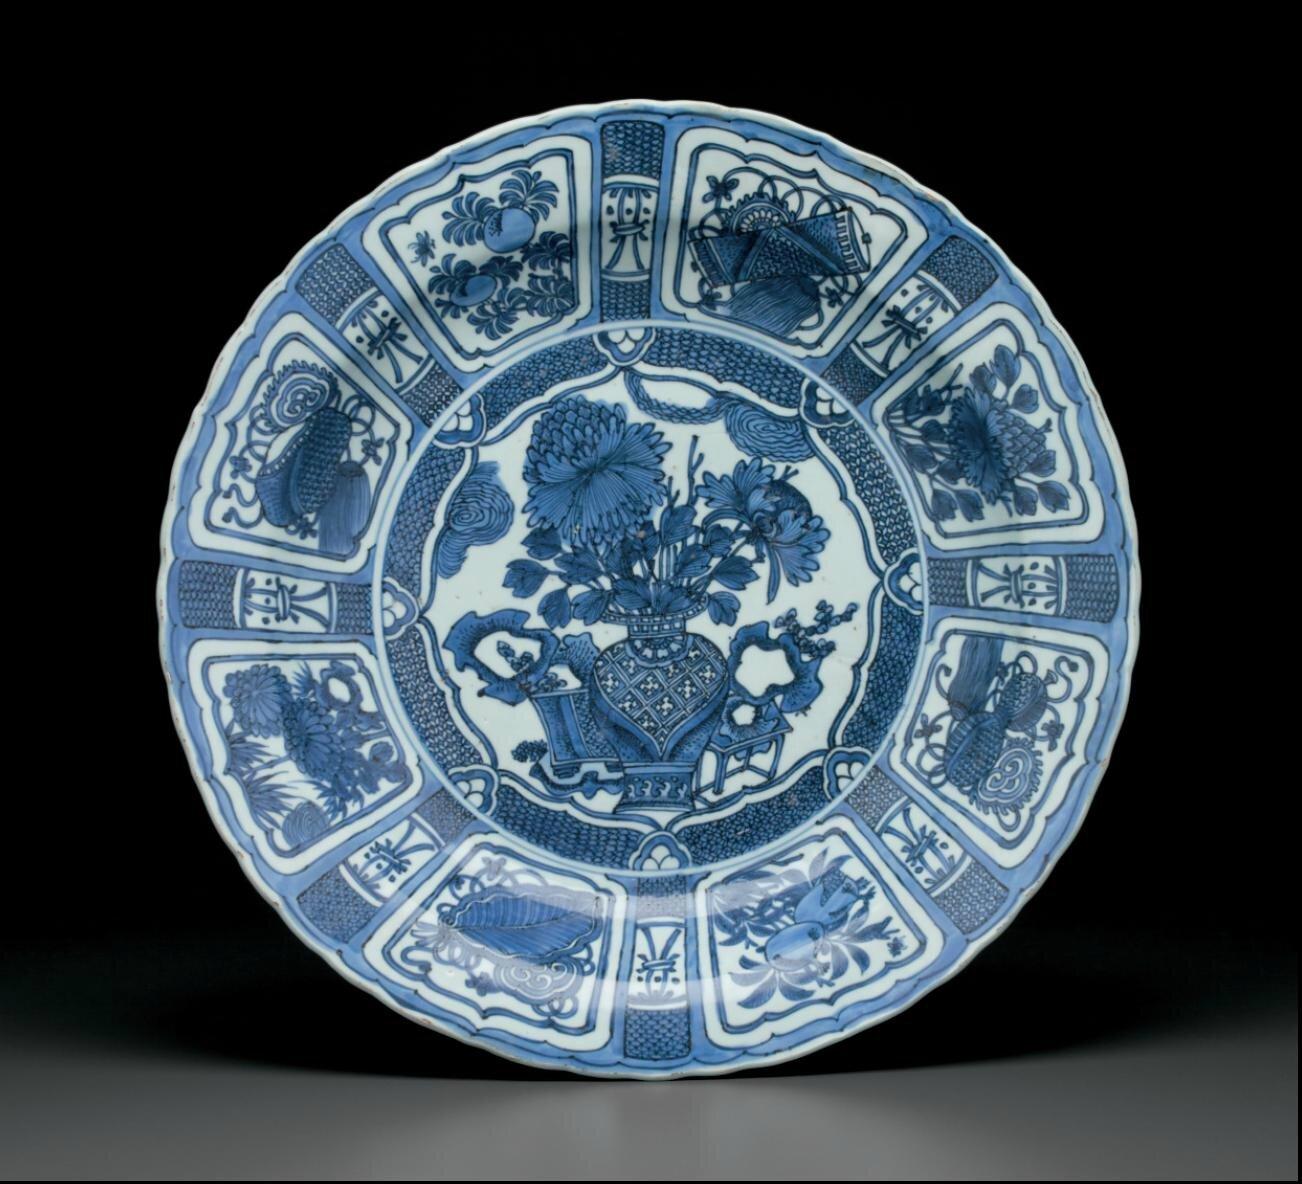 A largeKraakporcelain dish, Wanli period (1573-1619)